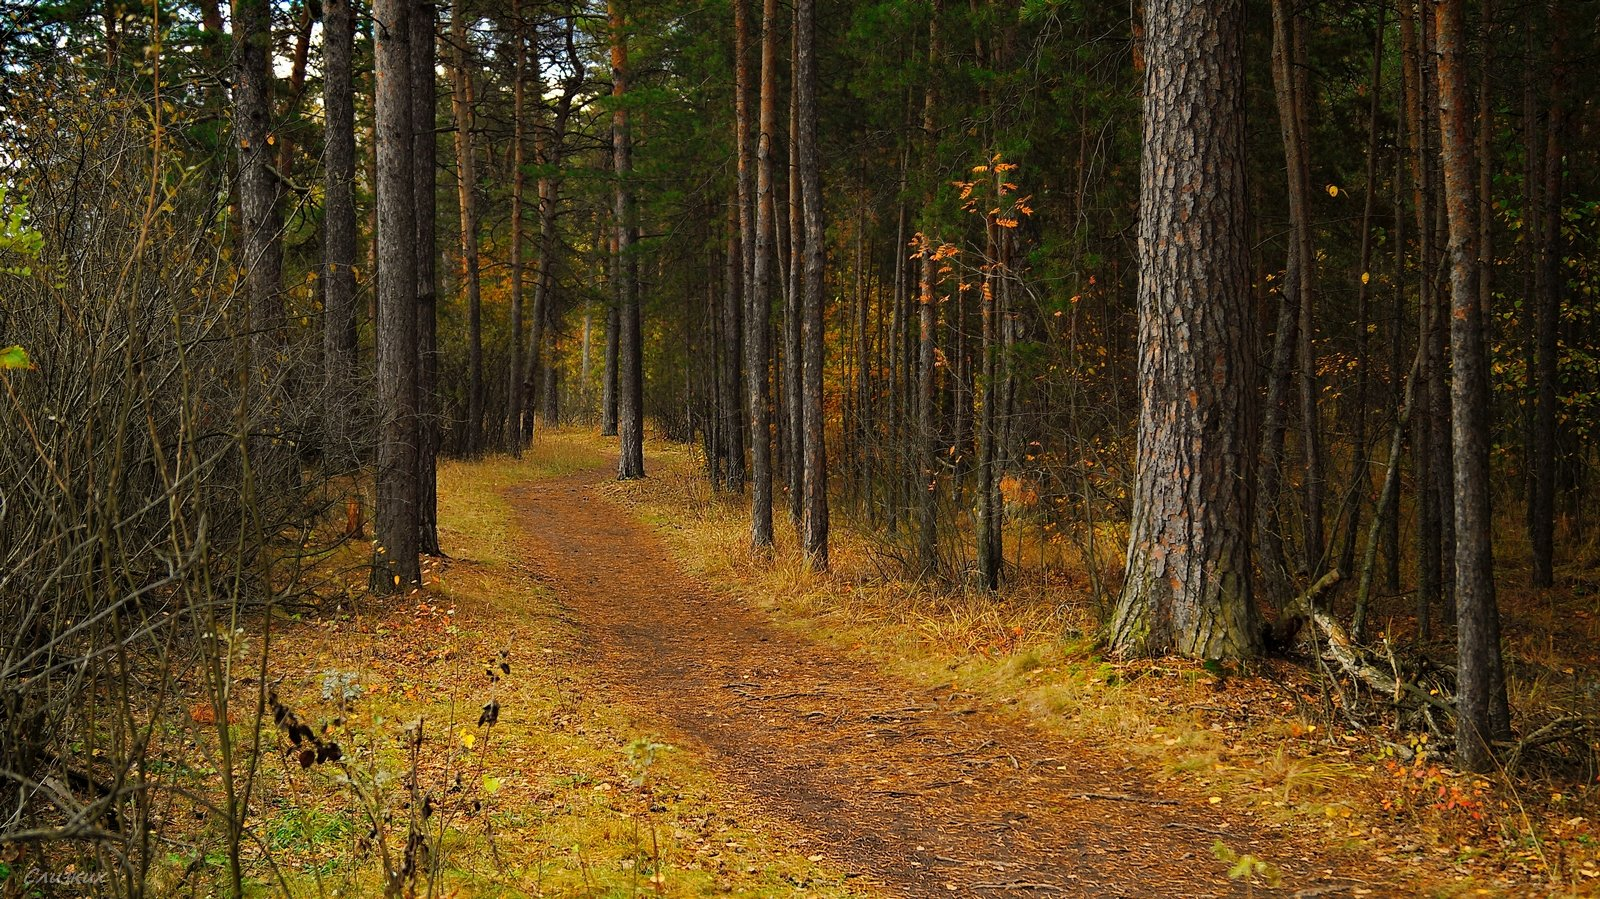 пейзаж,лес,тропинка,дорога,осень,лес,бор, Инаида